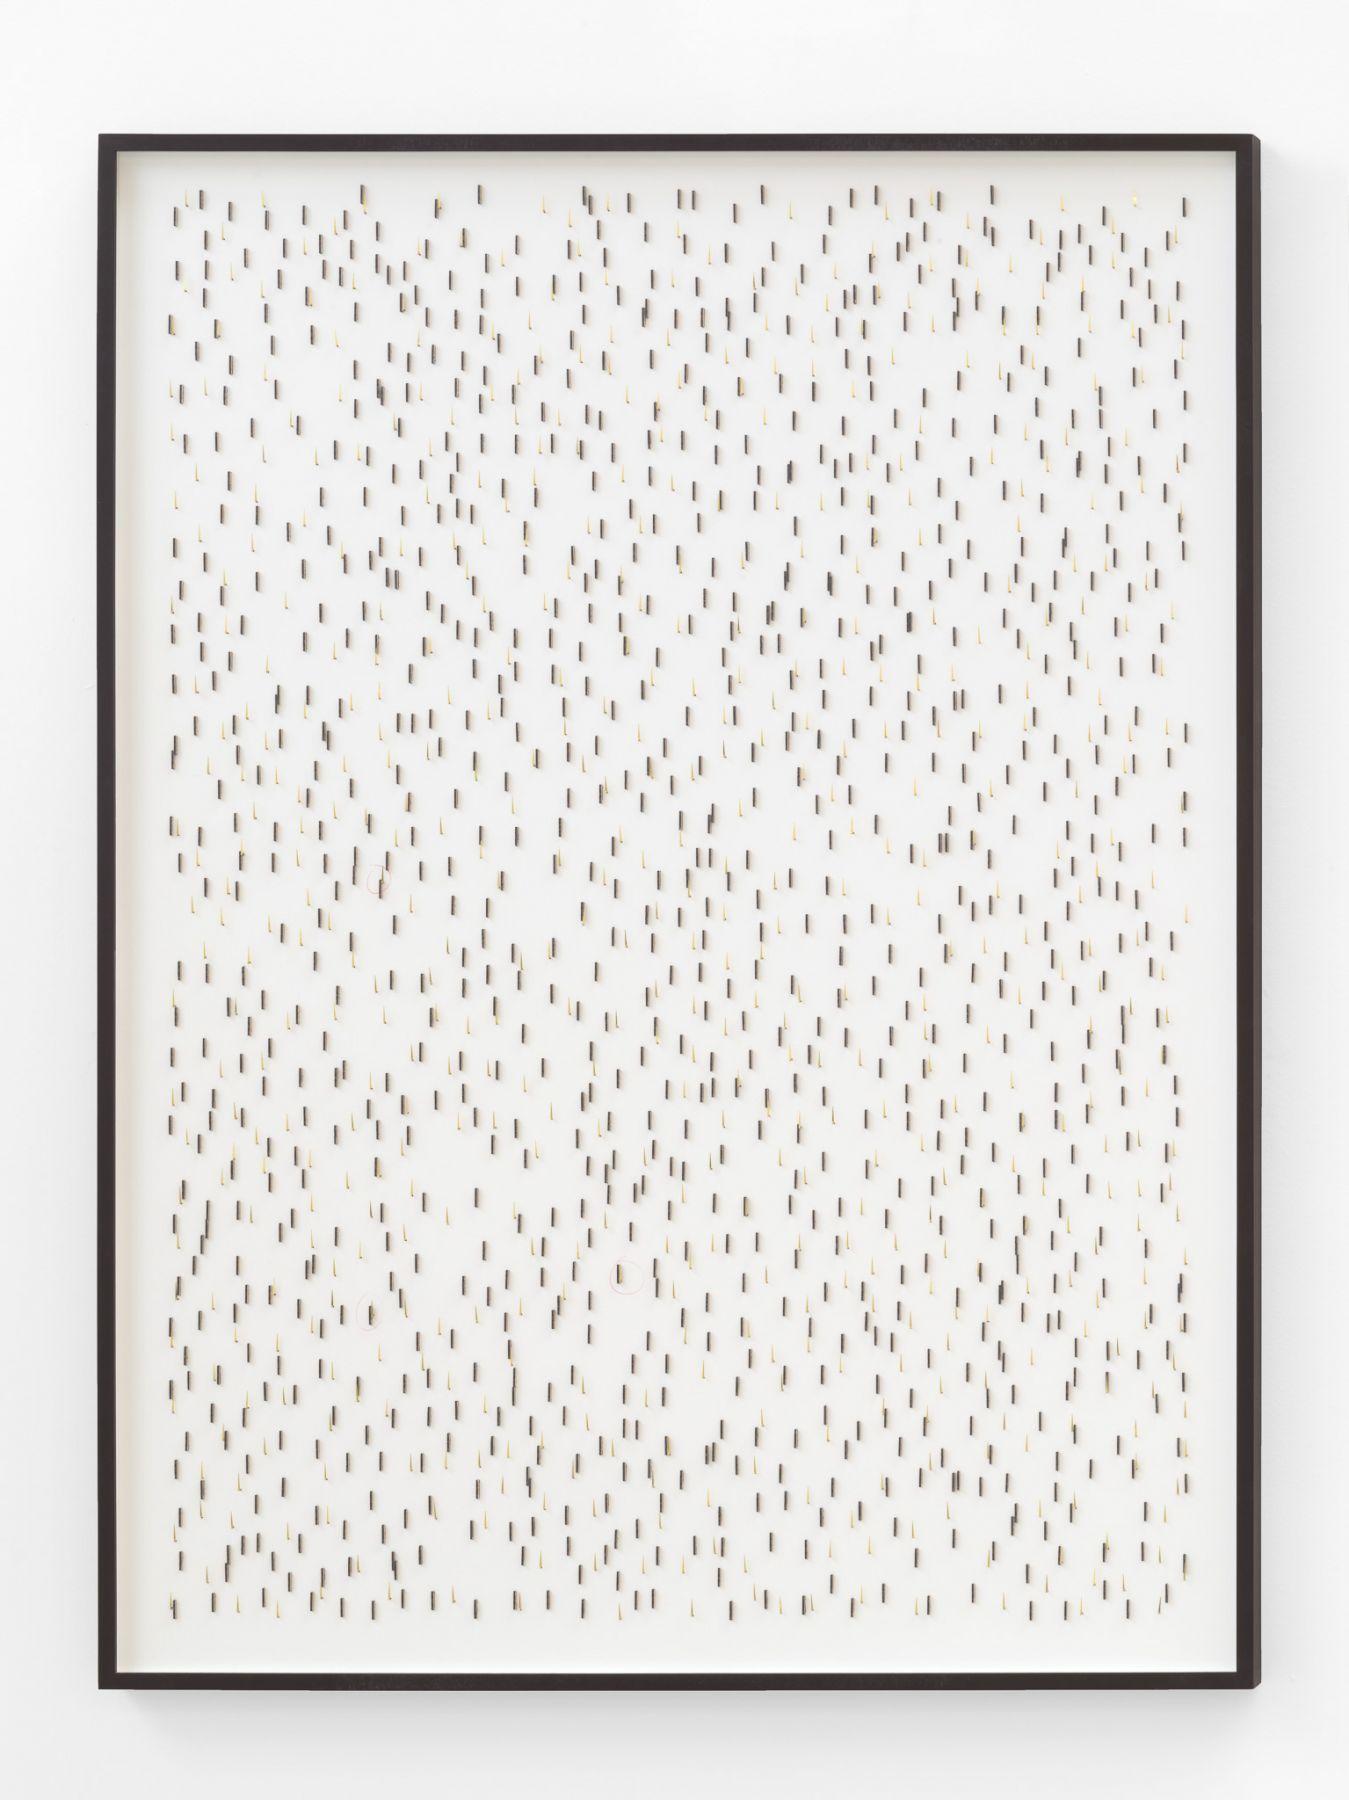 Alicja Kwade, Rain (10 minutes/ 100 cm), 2019